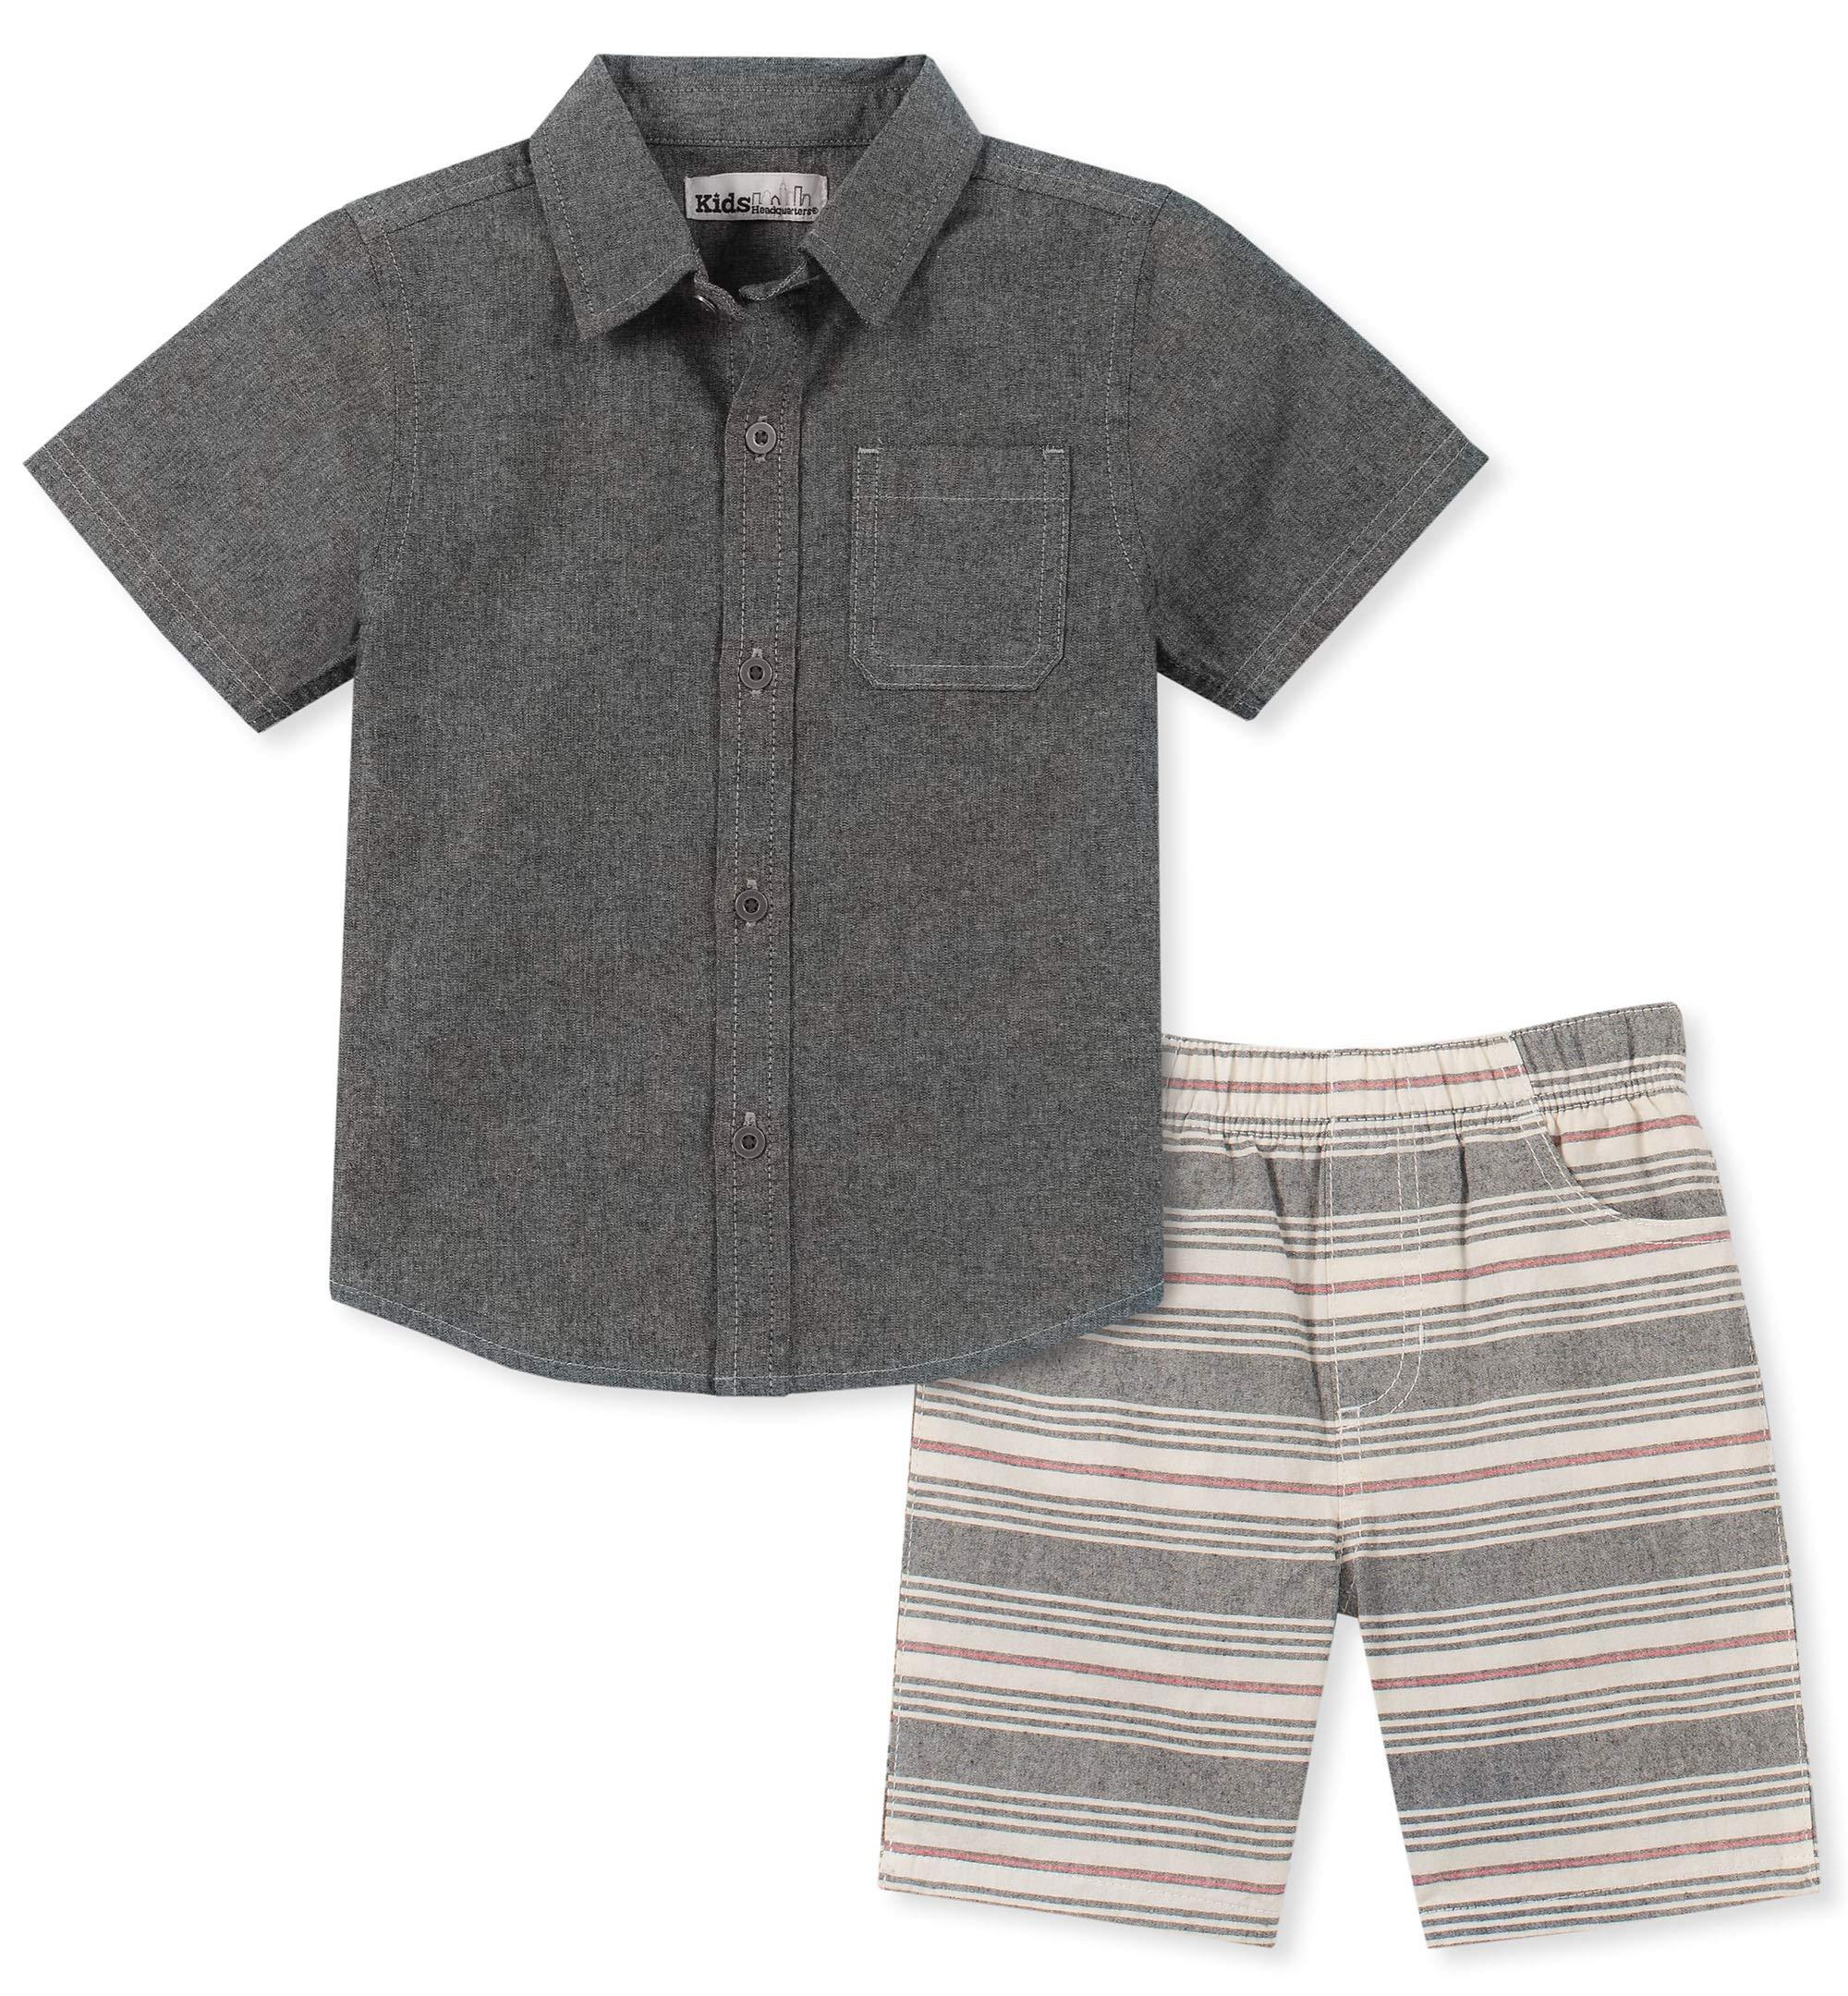 Kids Headquarters Boys' Toddler 2 Pieces Shirt Shorts Set, Charcoal 4T